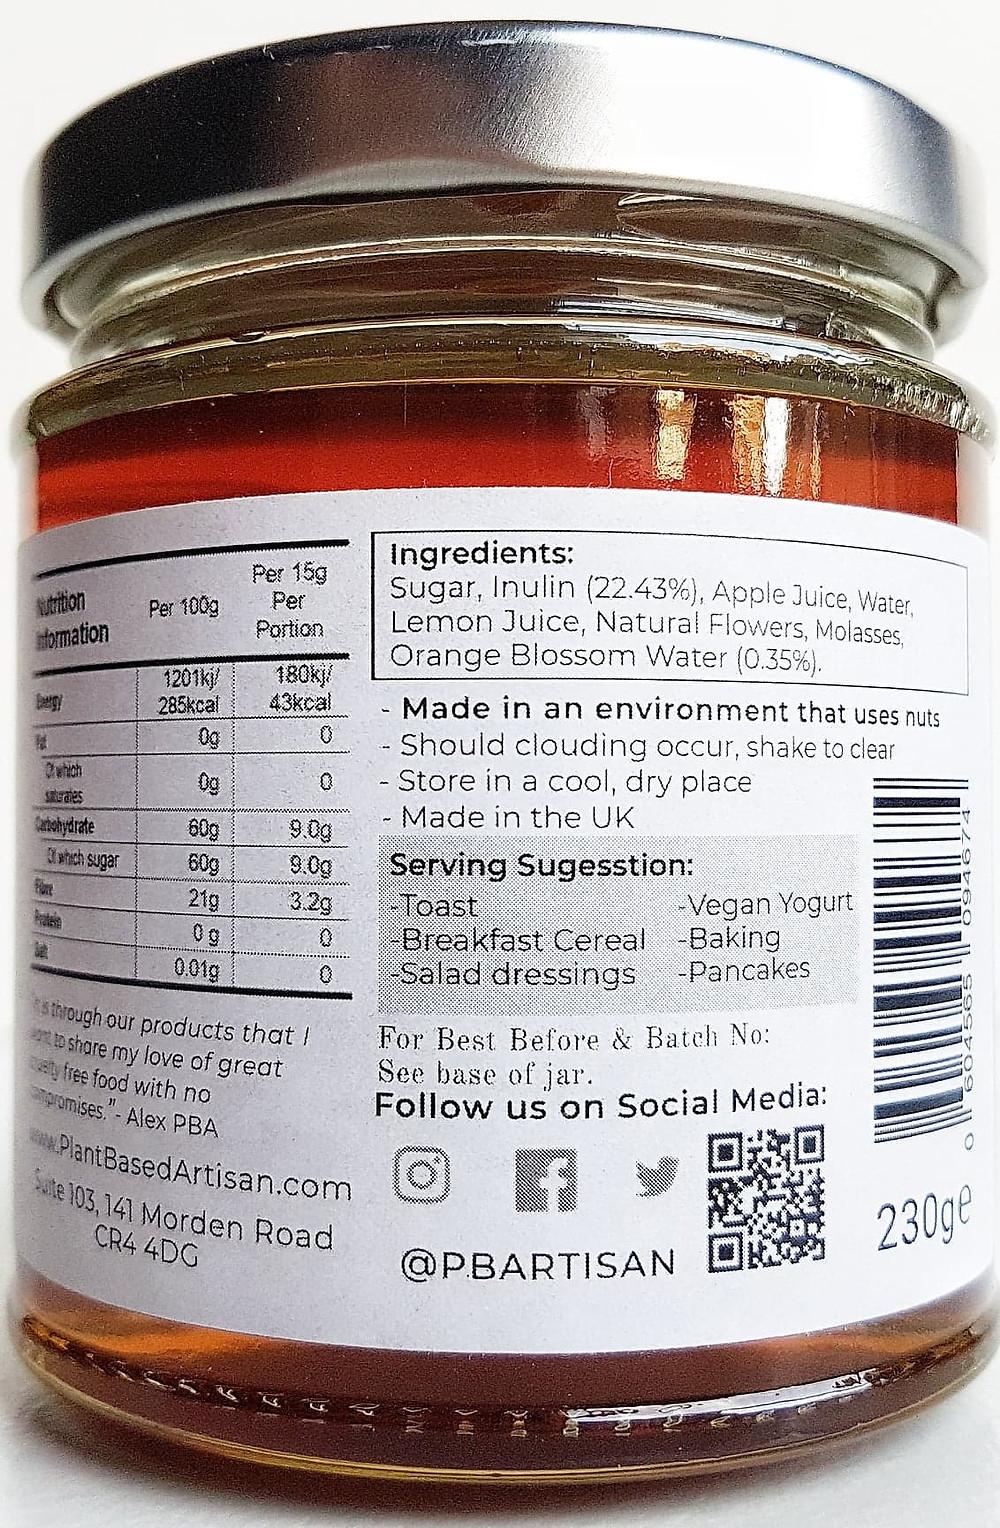 Plant Based Artisan vegan honey Orange Blossom Ingredients